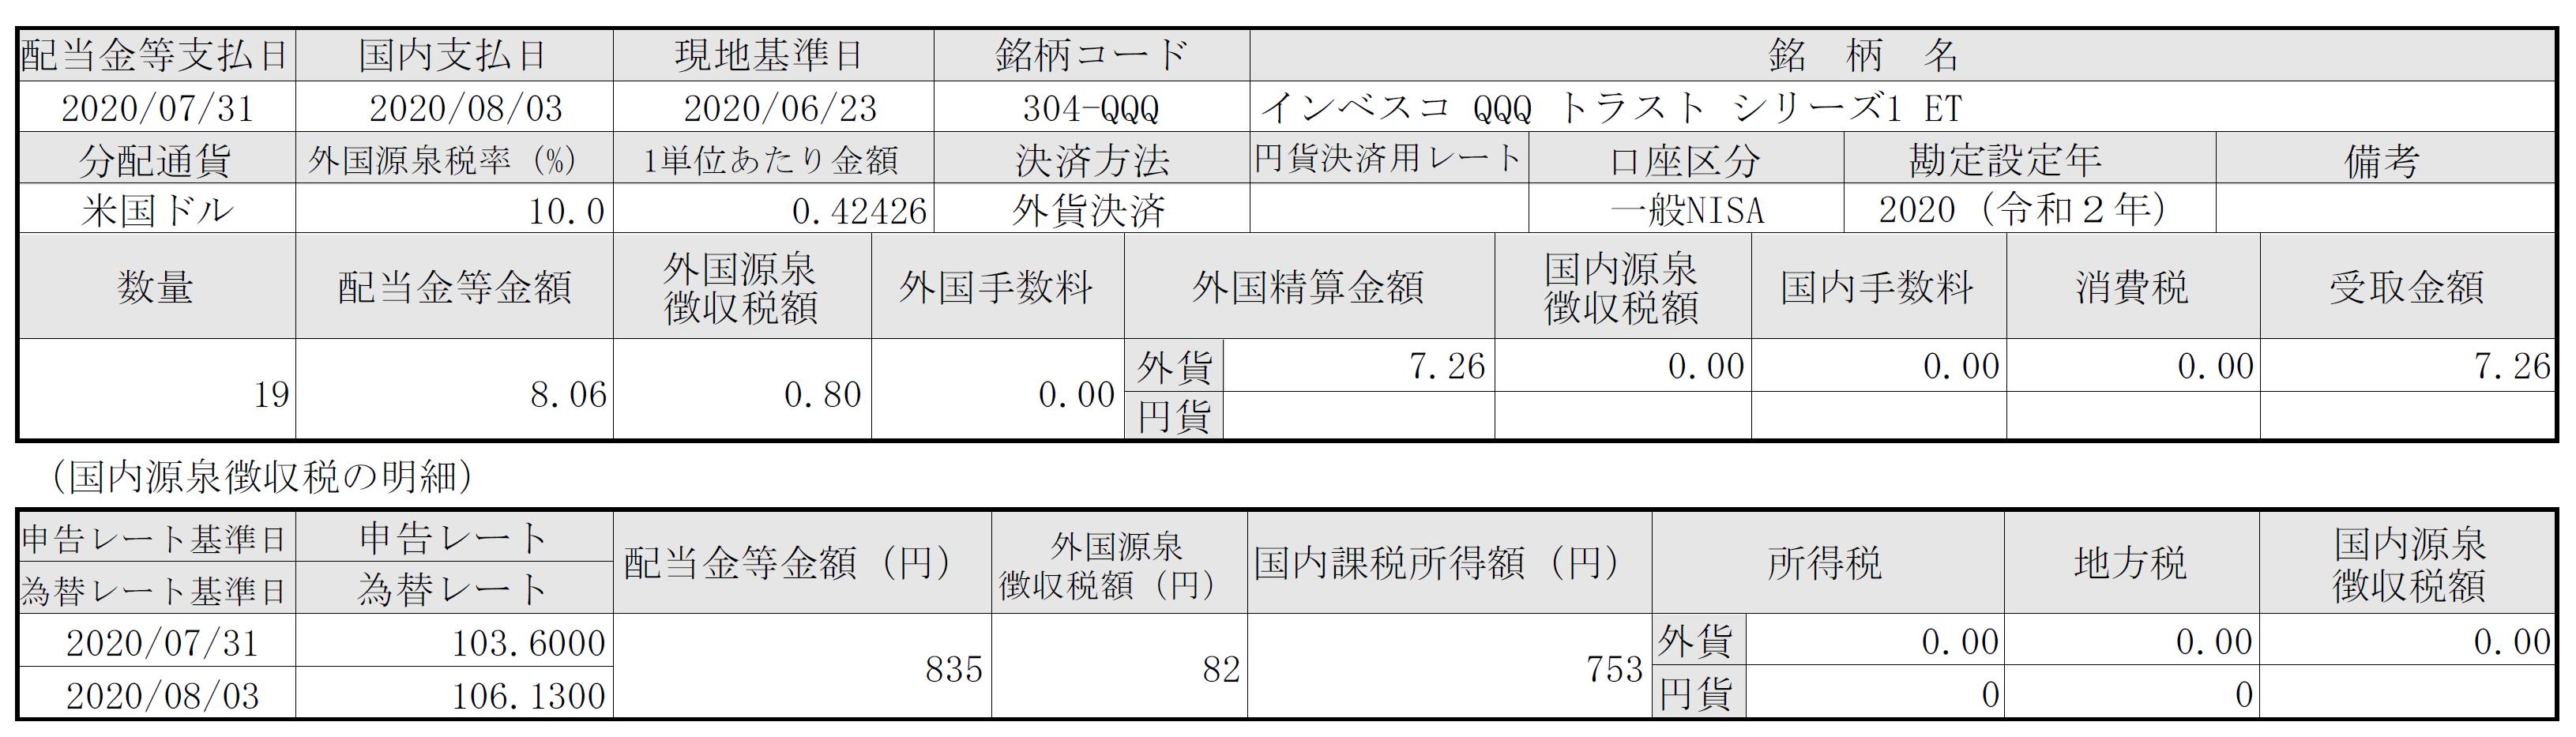 f:id:hodo-work:20200813093616p:plain